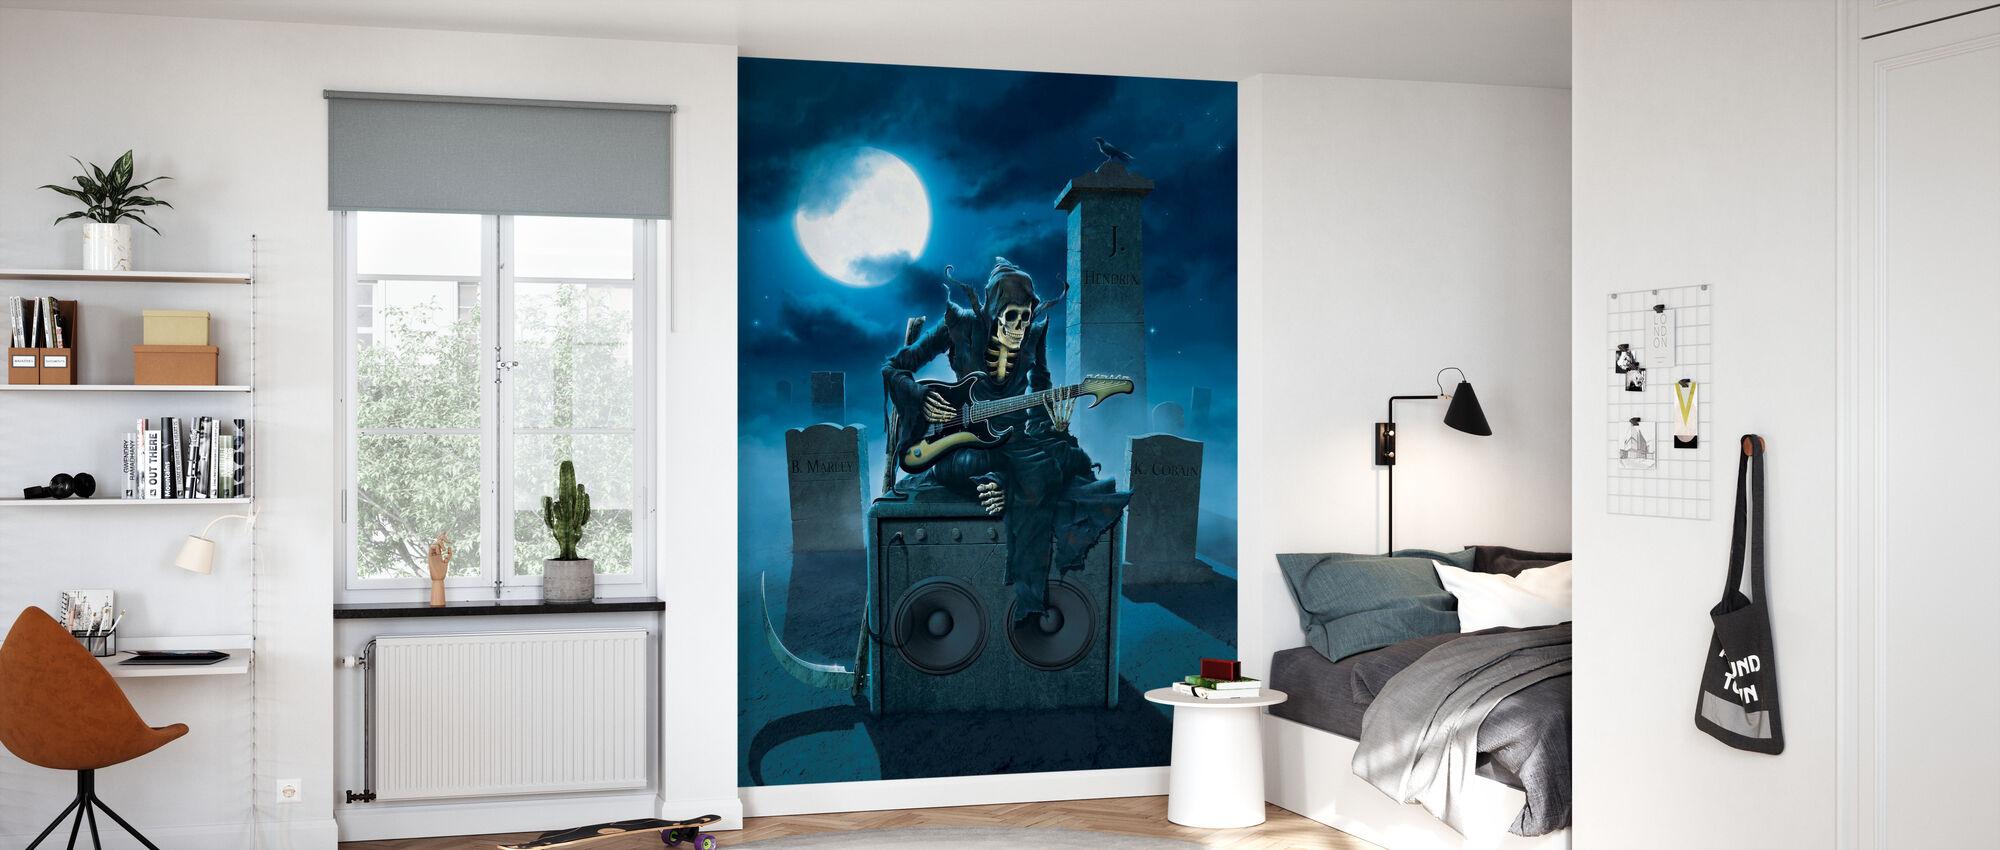 Tribute - Wallpaper - Kids Room